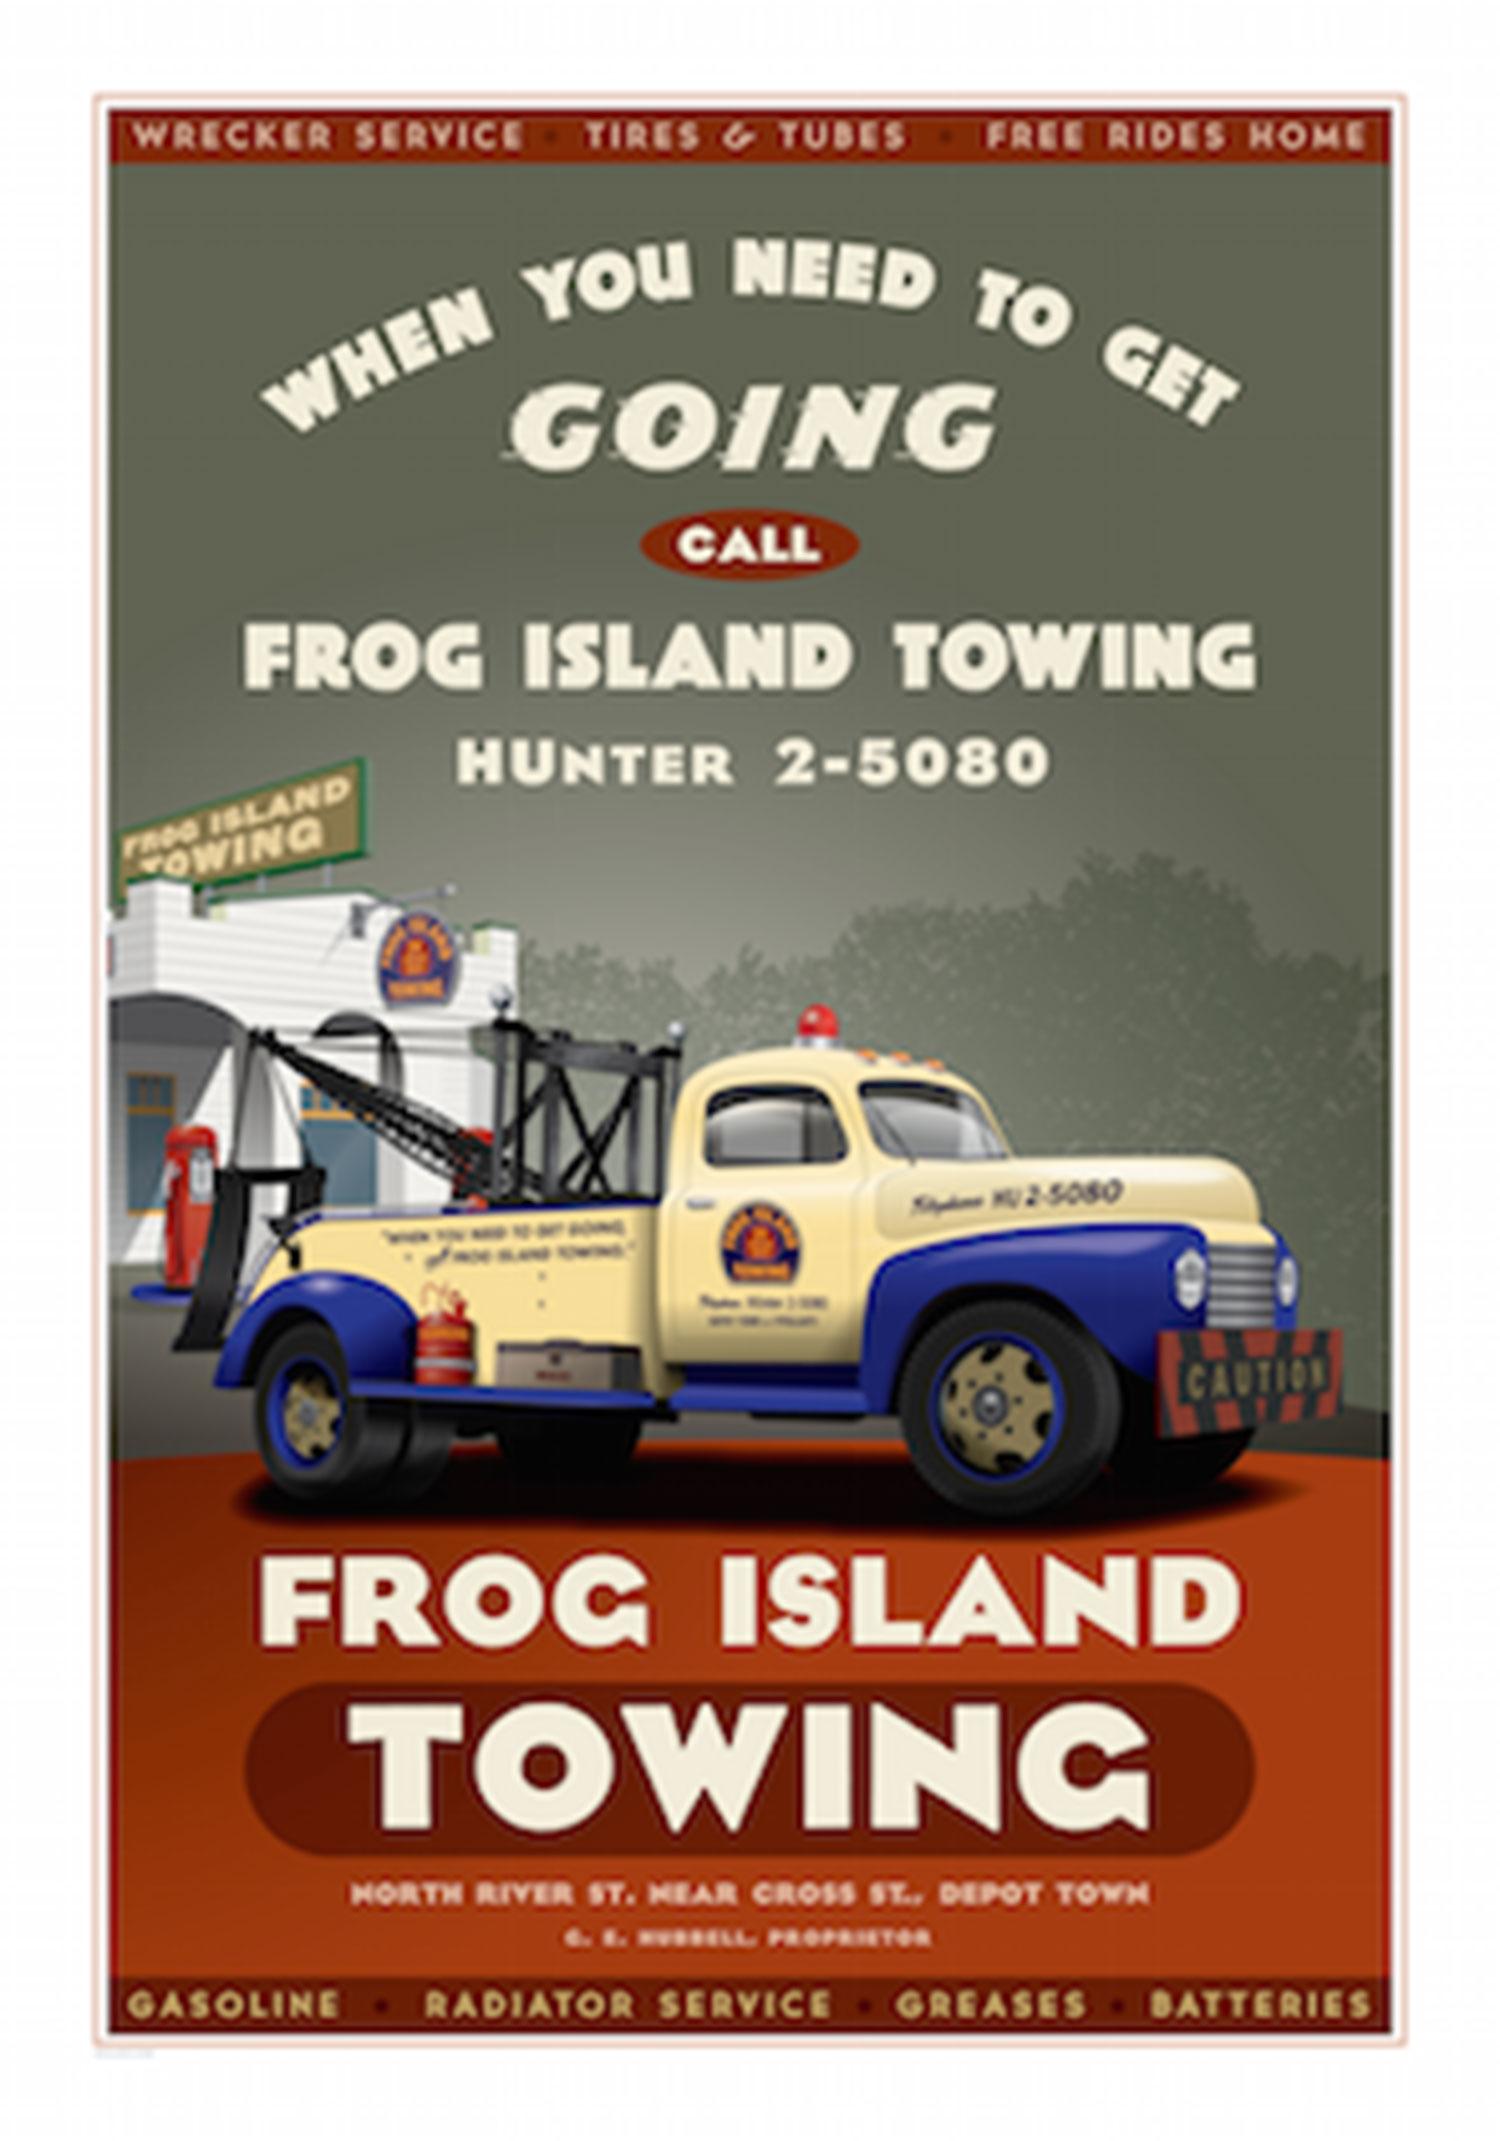 Ypsilanti Frog Island Towing Poster